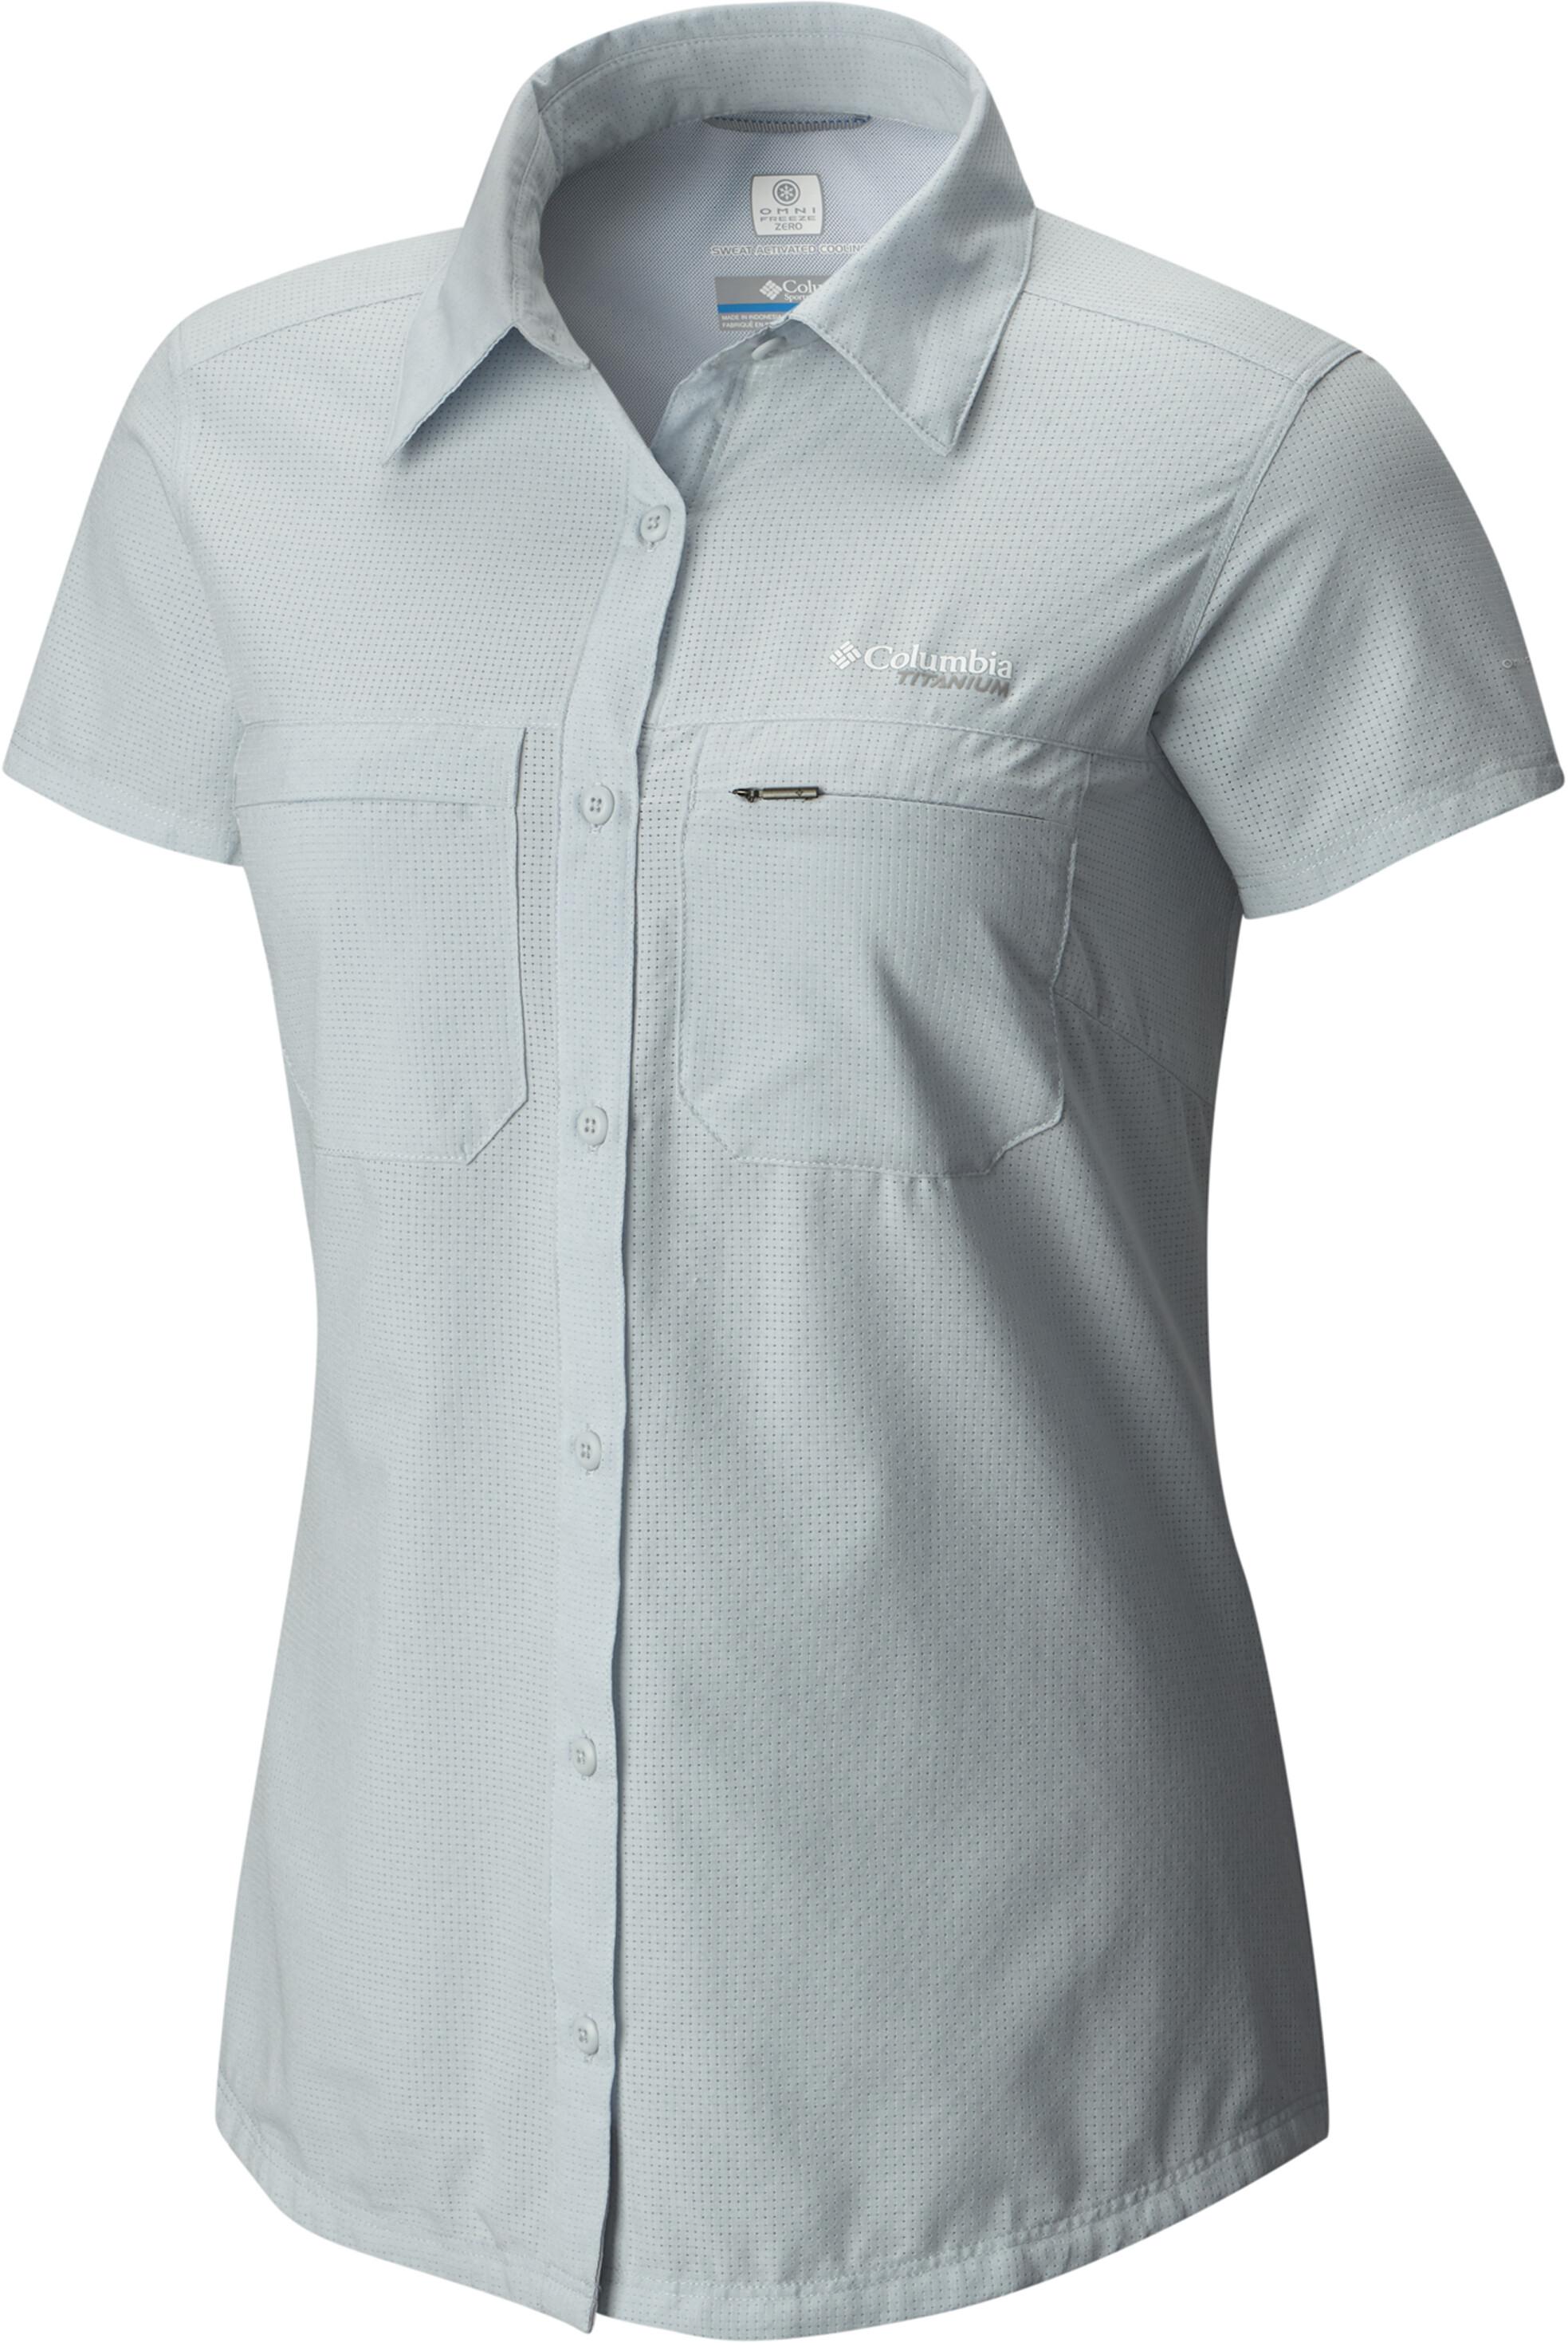 Nueva York e73c3 c6808 Columbia Irico Camiseta manga corta Mujer, cirrus grey heather